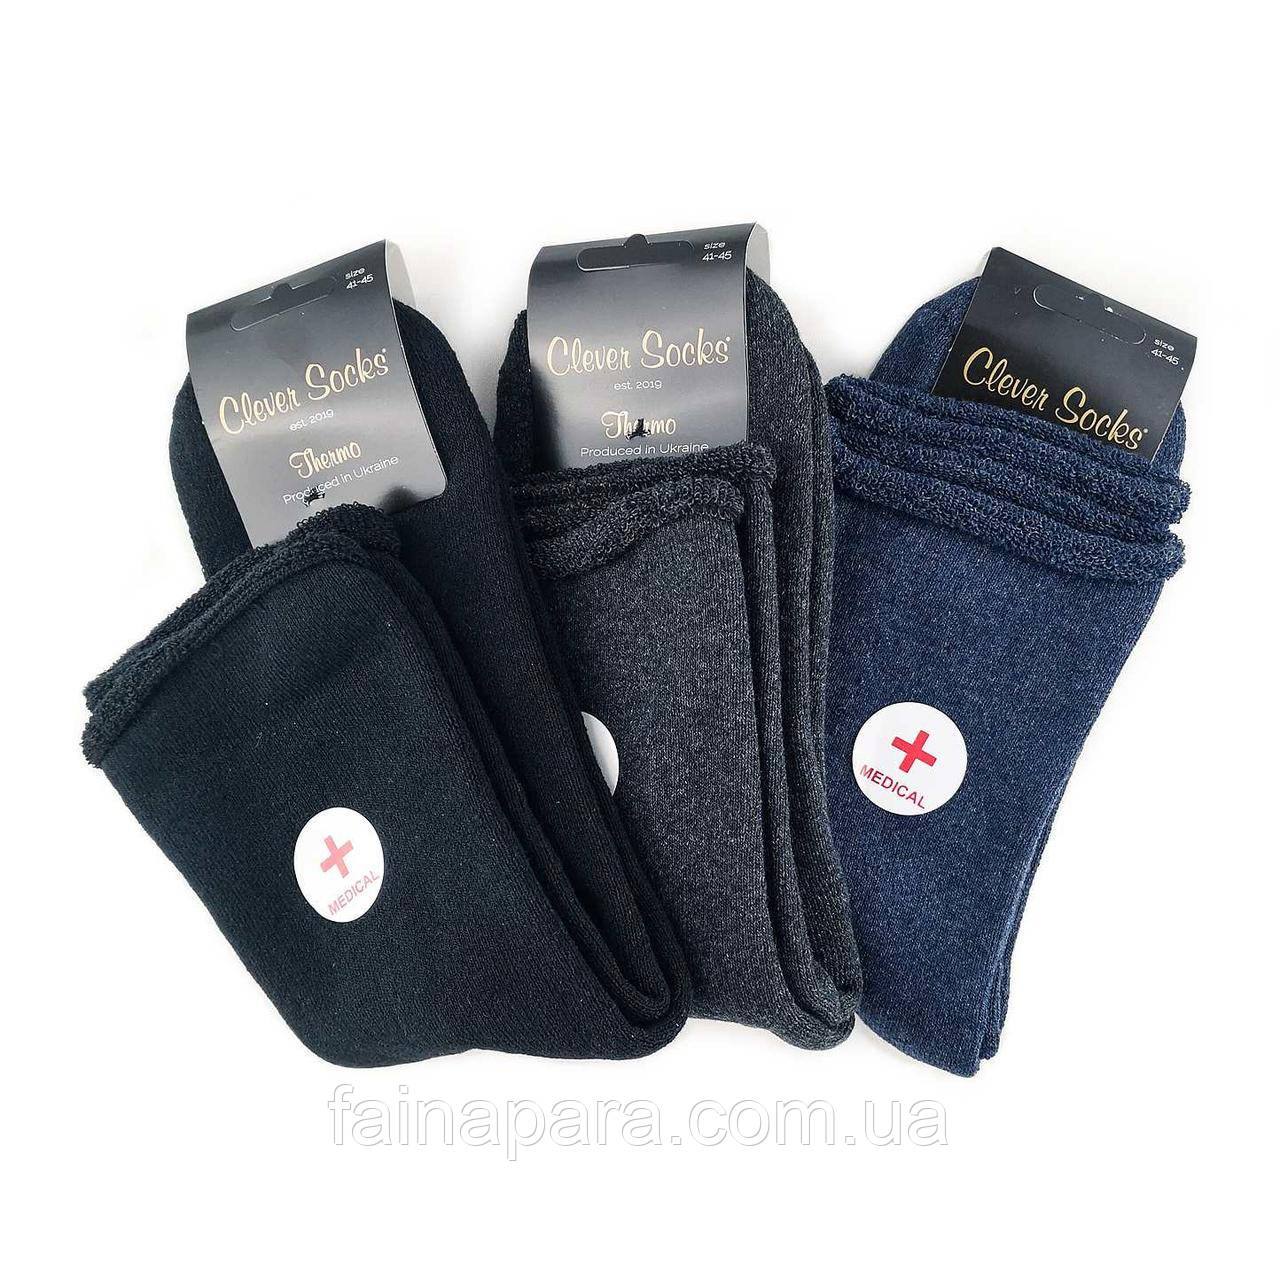 Махровые мужские носки без резинки